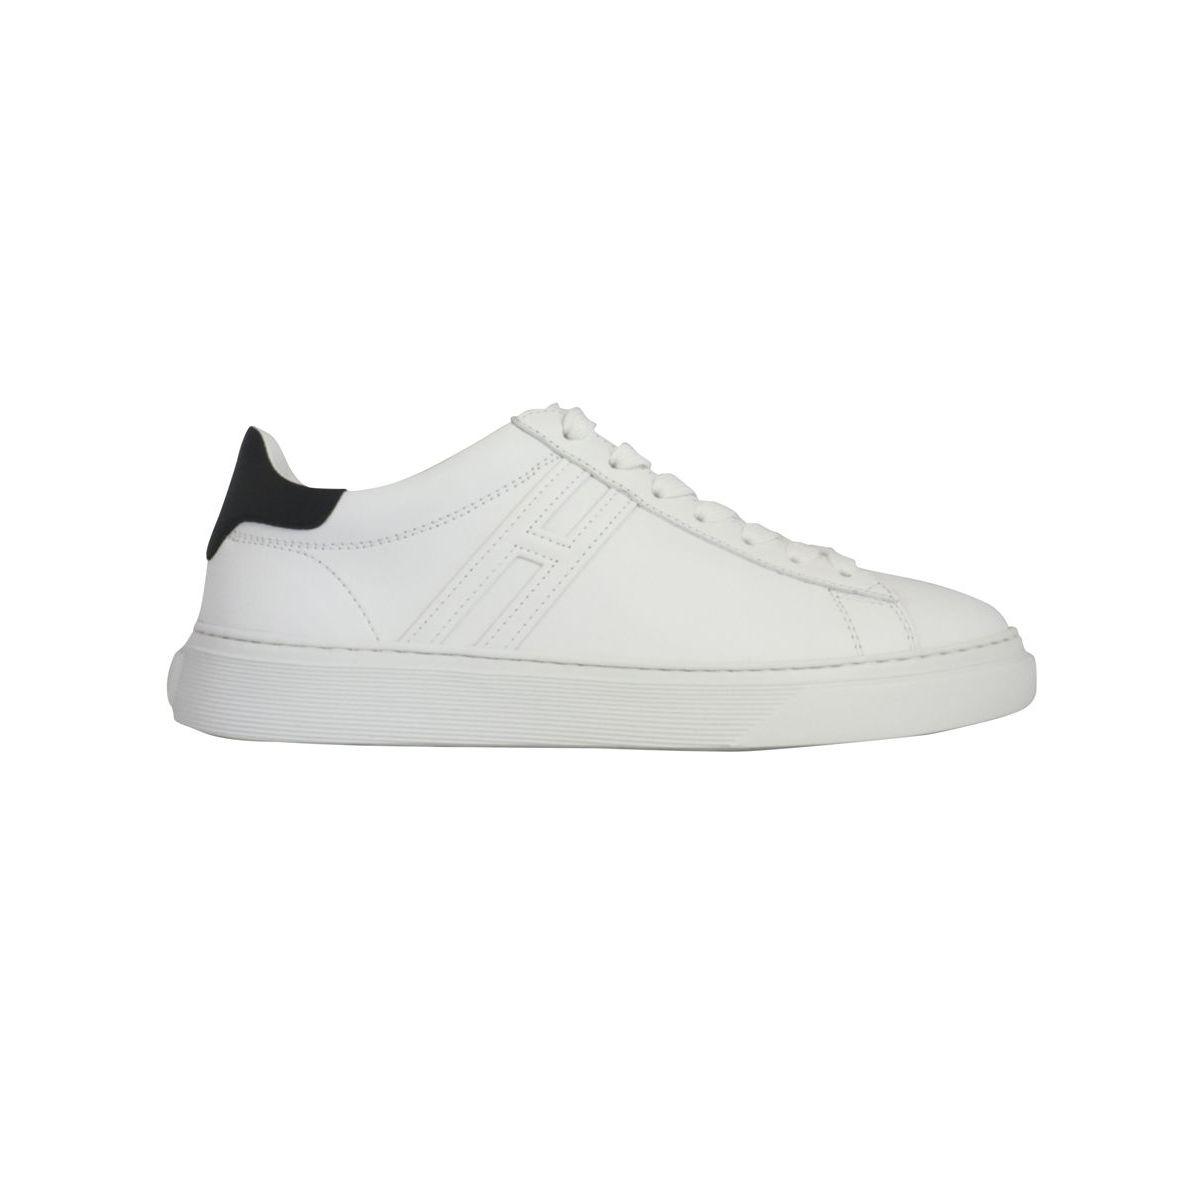 Hogan 365 sneakers in leather